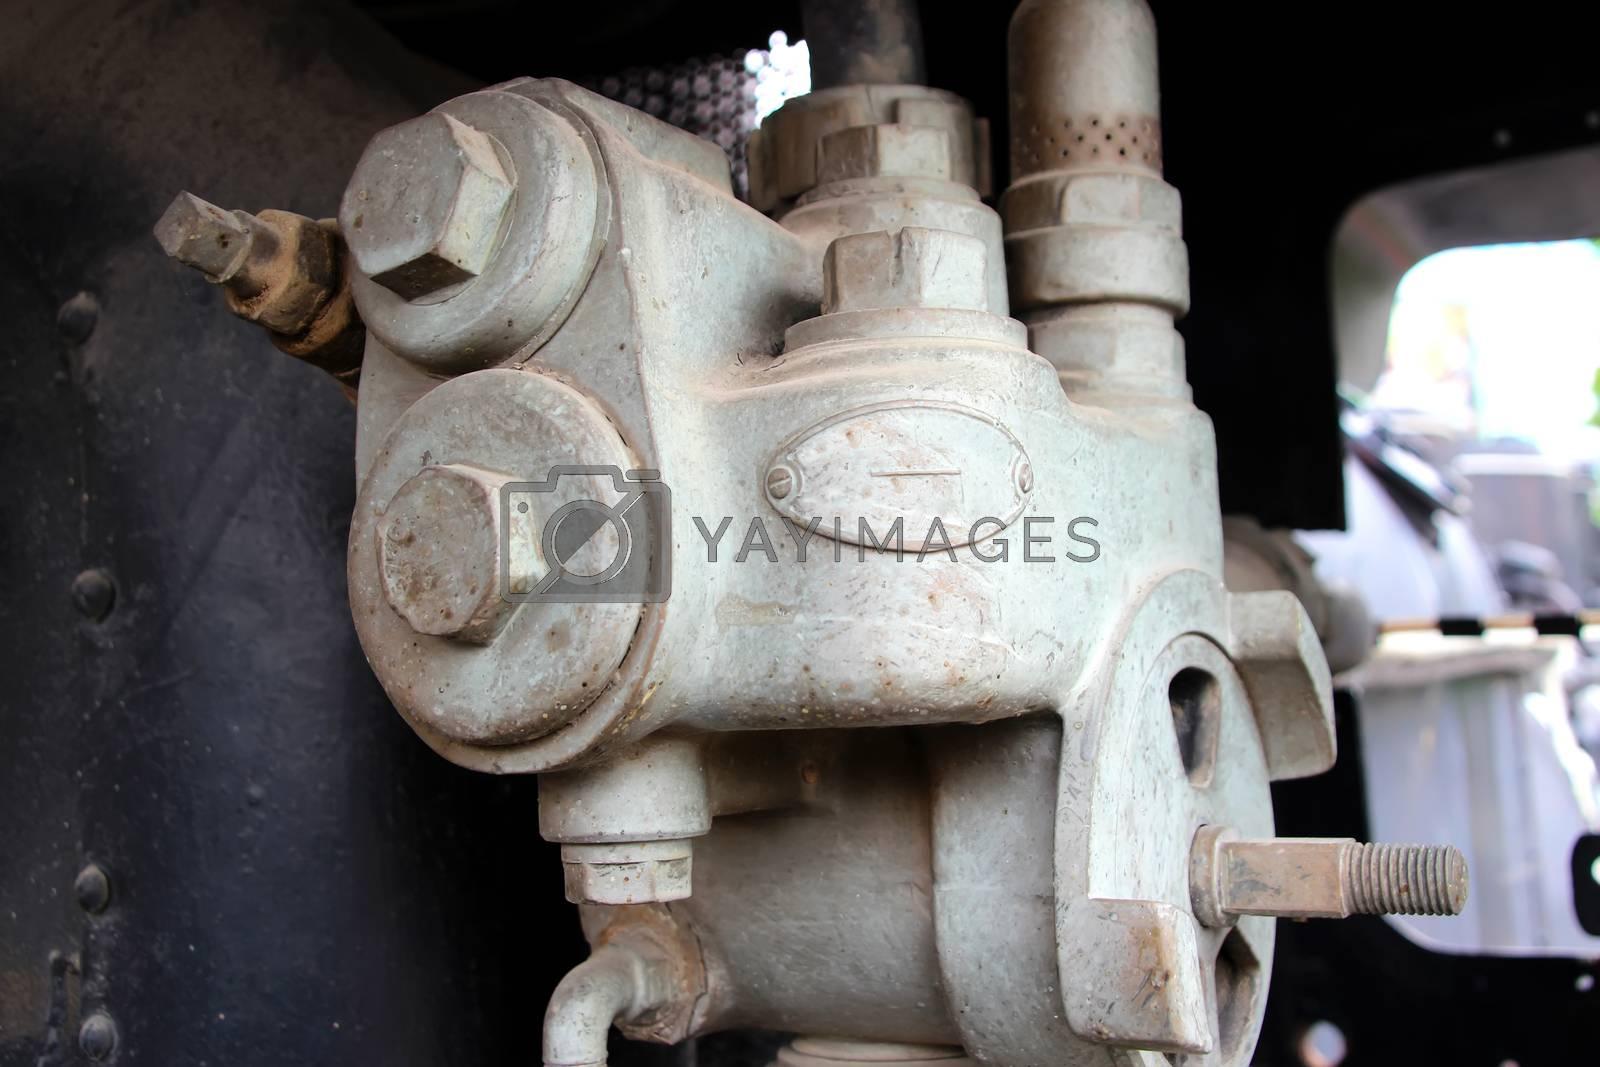 Old steam engine steam pressure regulator, Cambodia